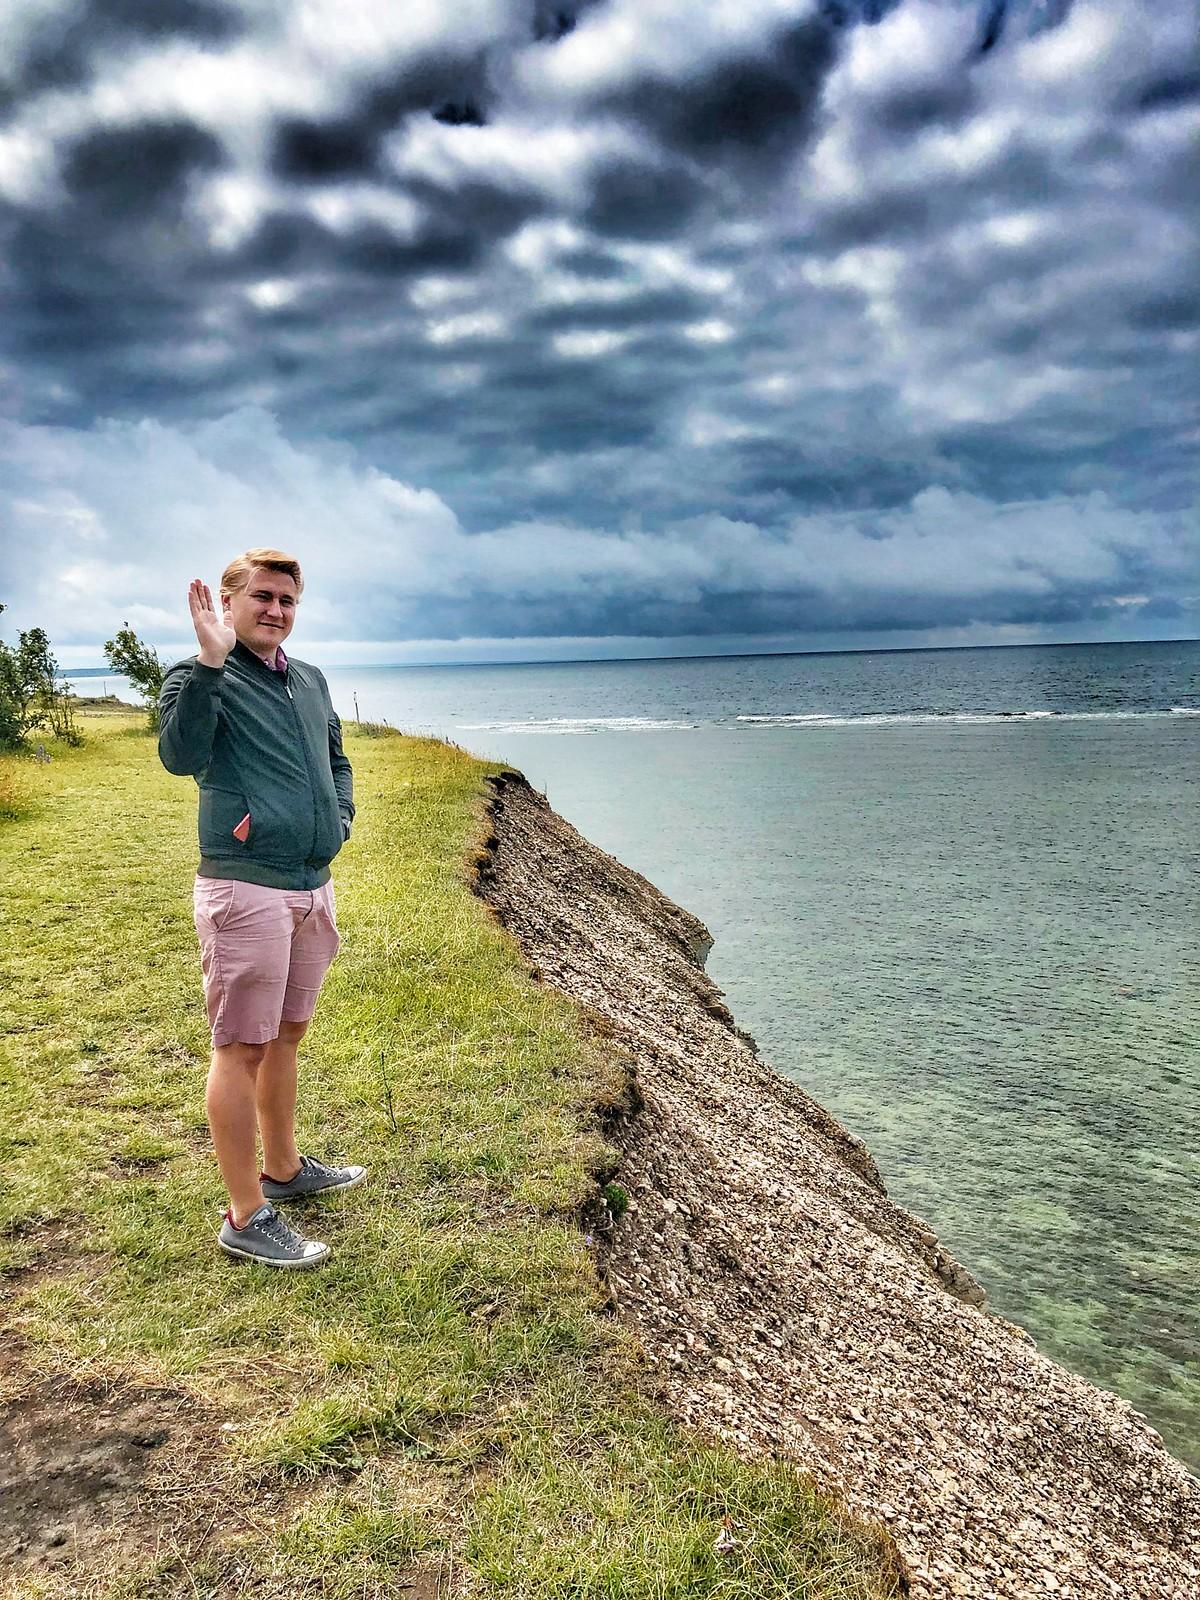 Pangan-jyrkänne-saarenmaa